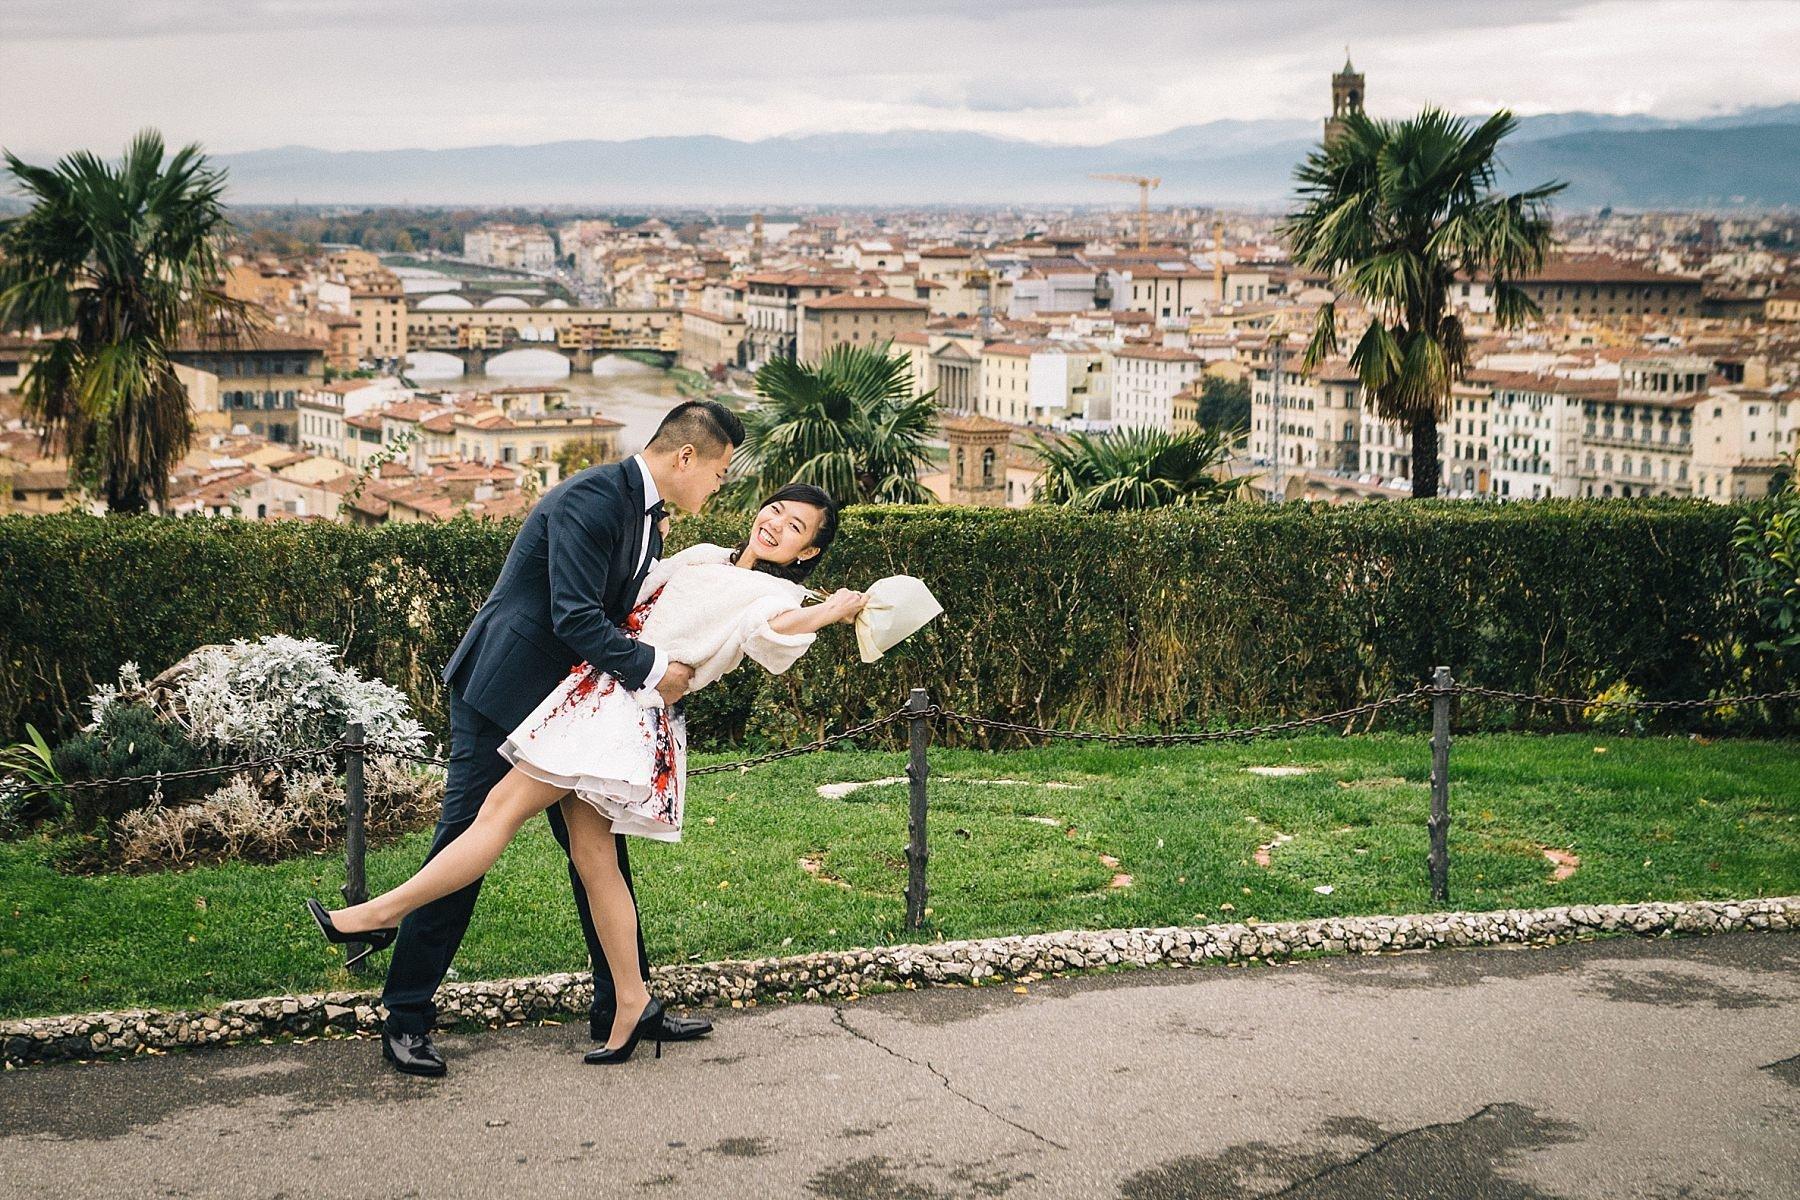 fotografo di matrimoni a firenze four seasons 09 1